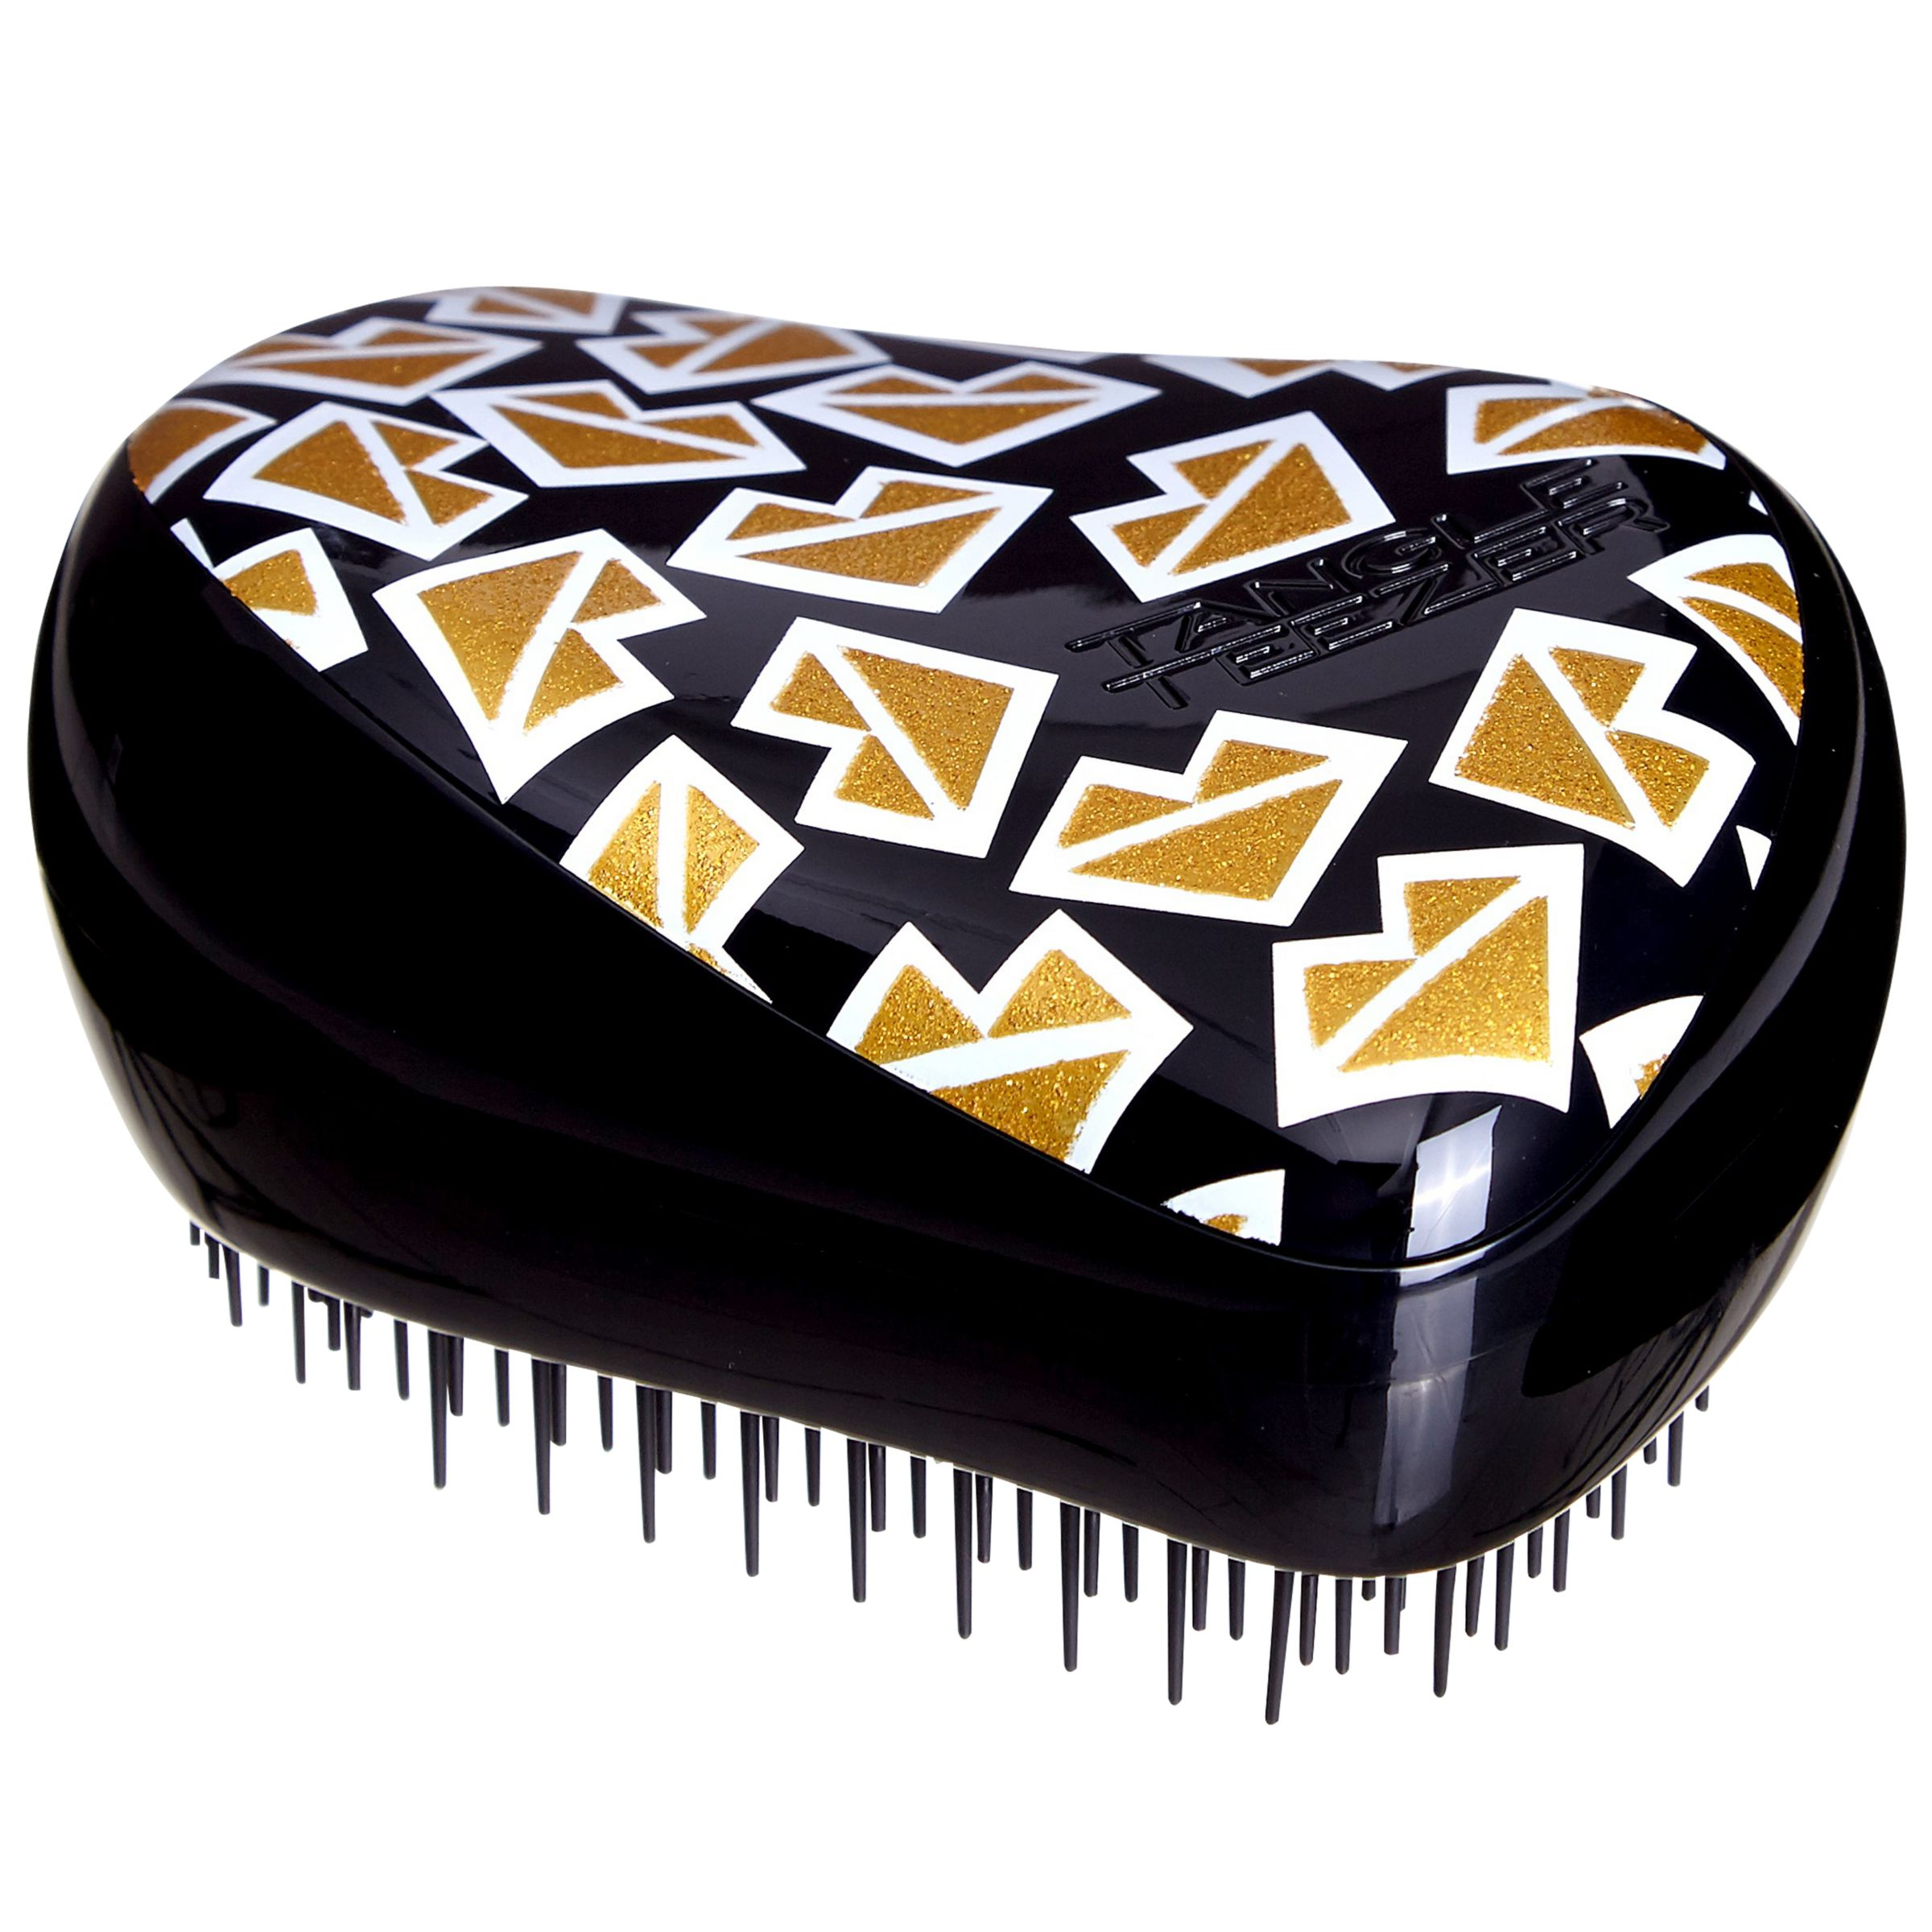 Tangle Teezer Tangle Teezer Compact Syler Markus Lupfer Hair Brush